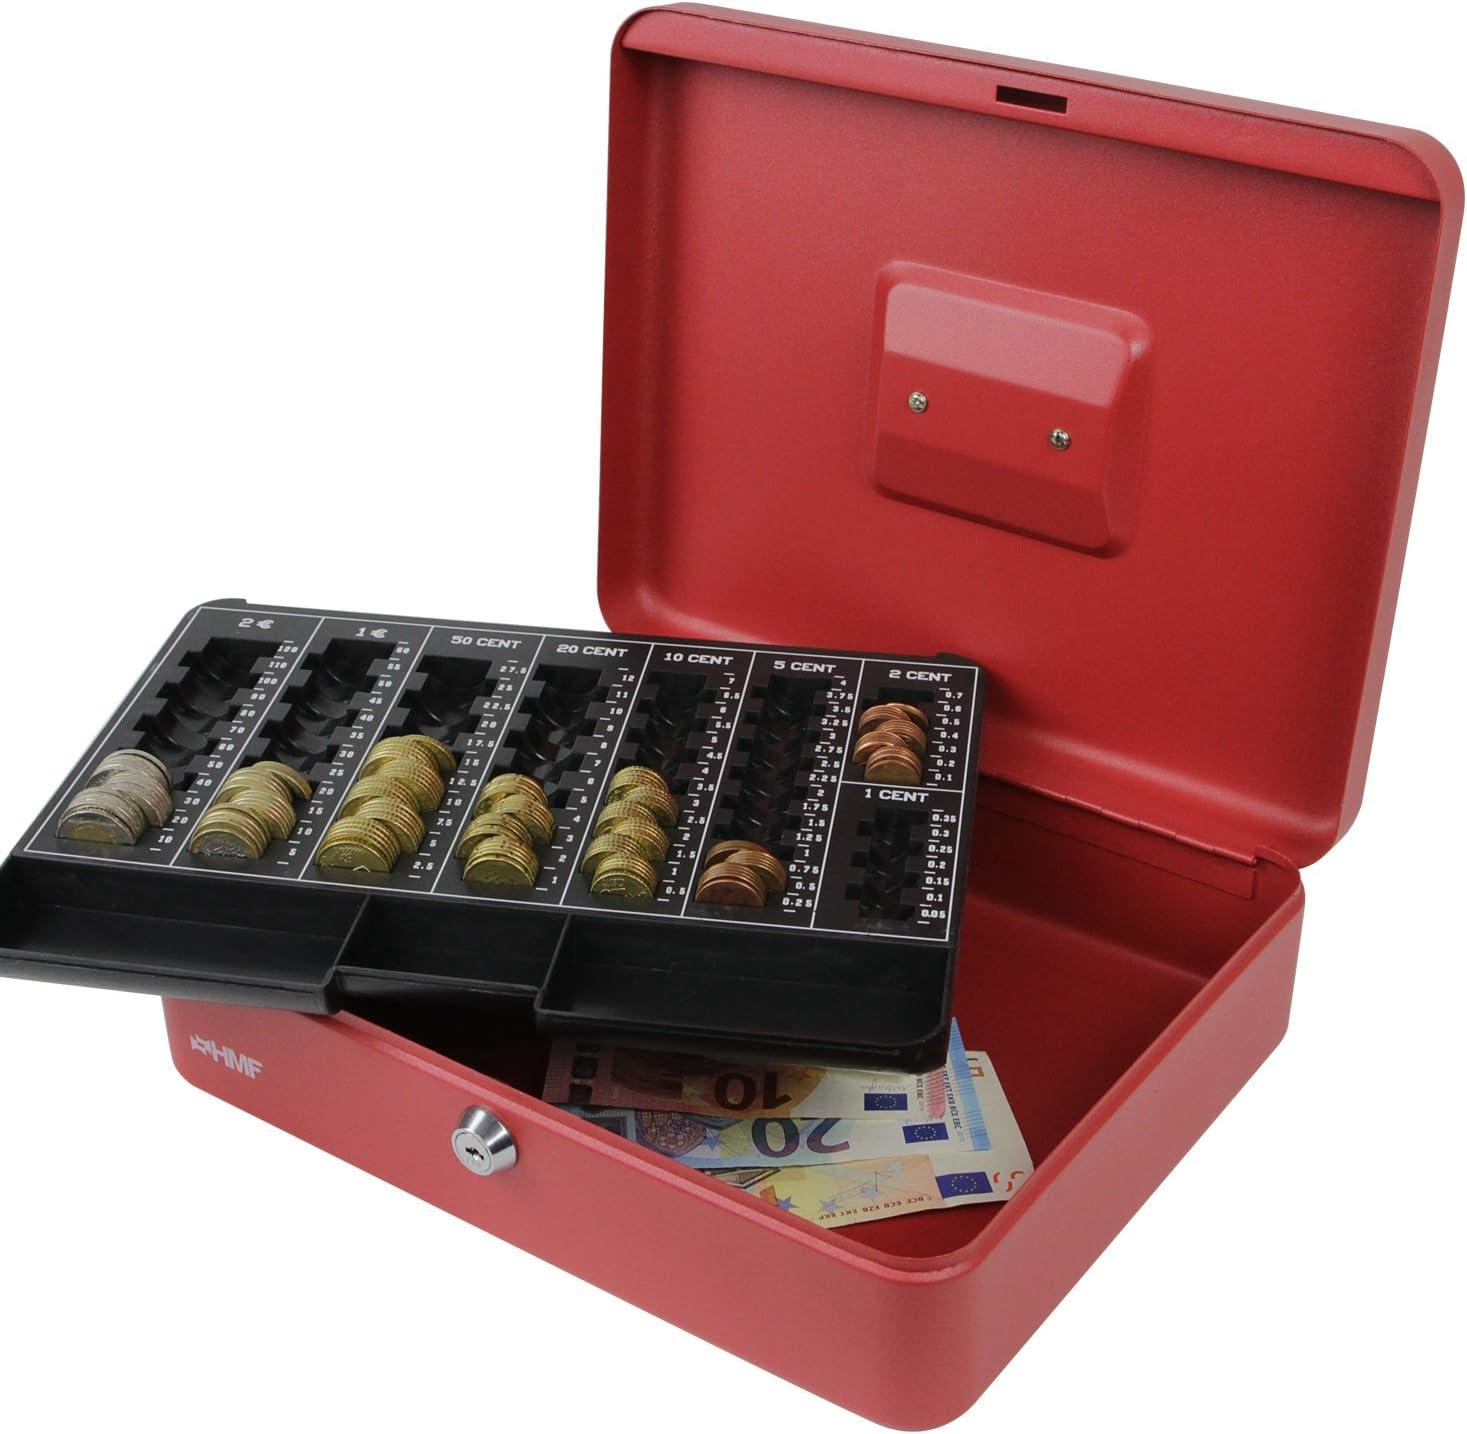 silber HMF 108-09 Geldkassette Euro-M/ünzz/ählbrett 30 x 24 x 9 cm